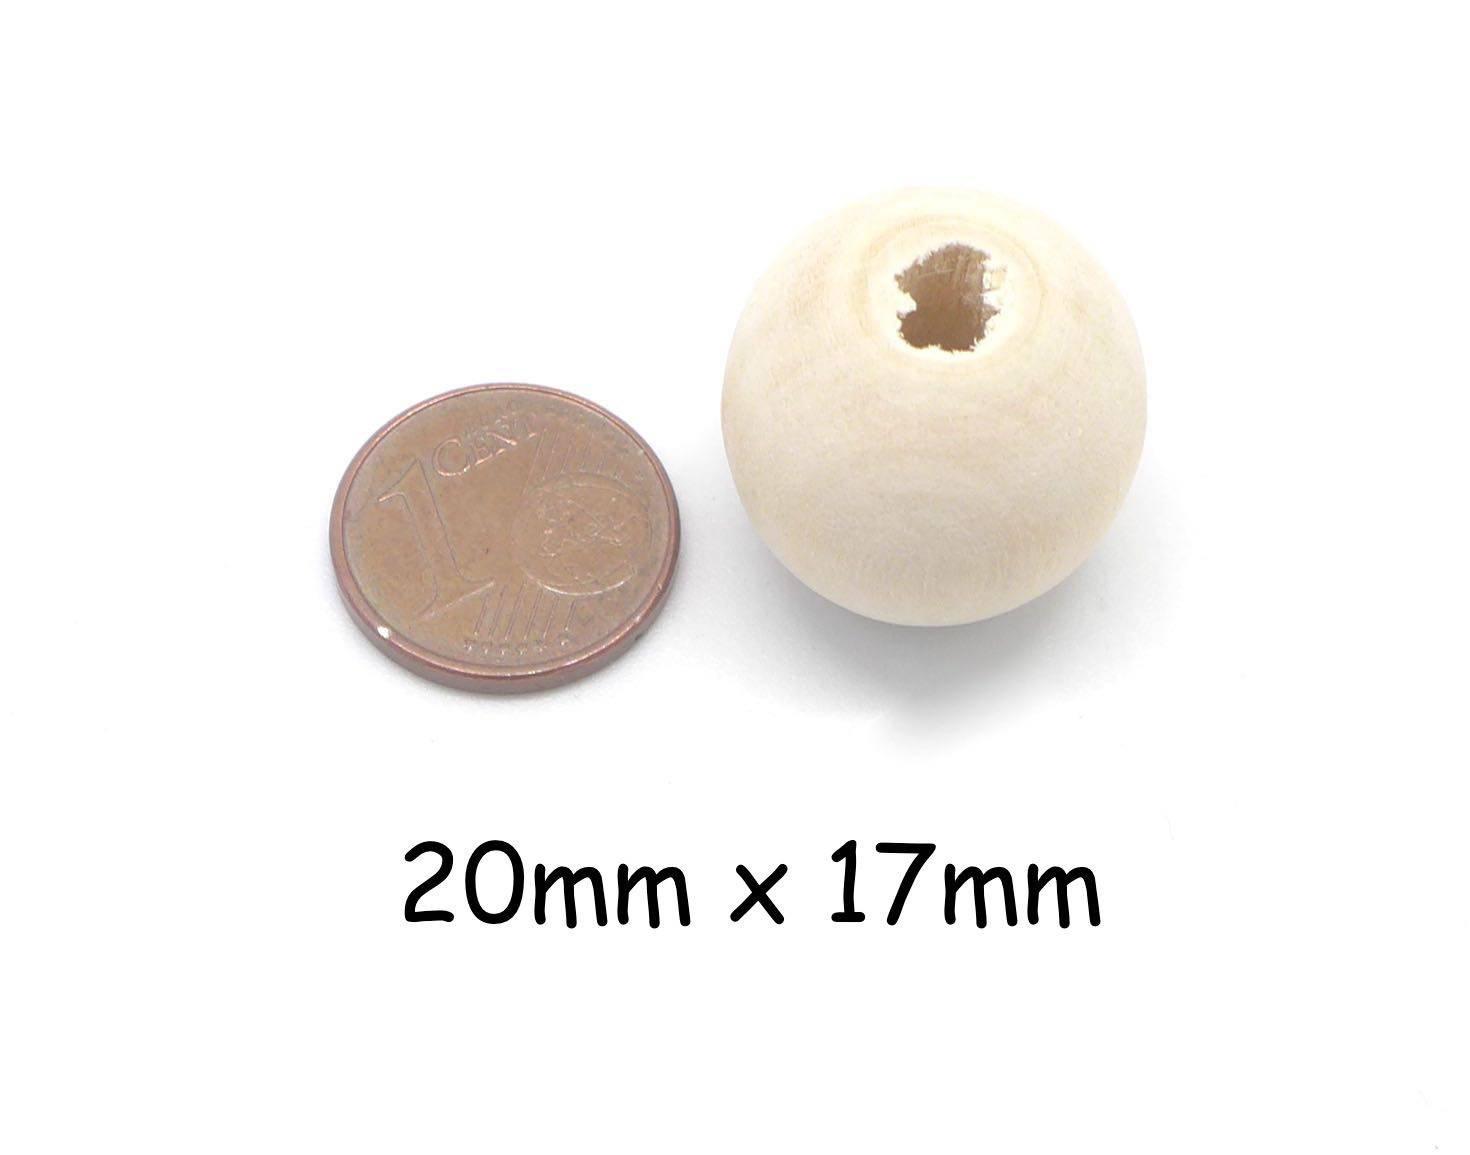 10 perles en bois naturel ronde 20mm